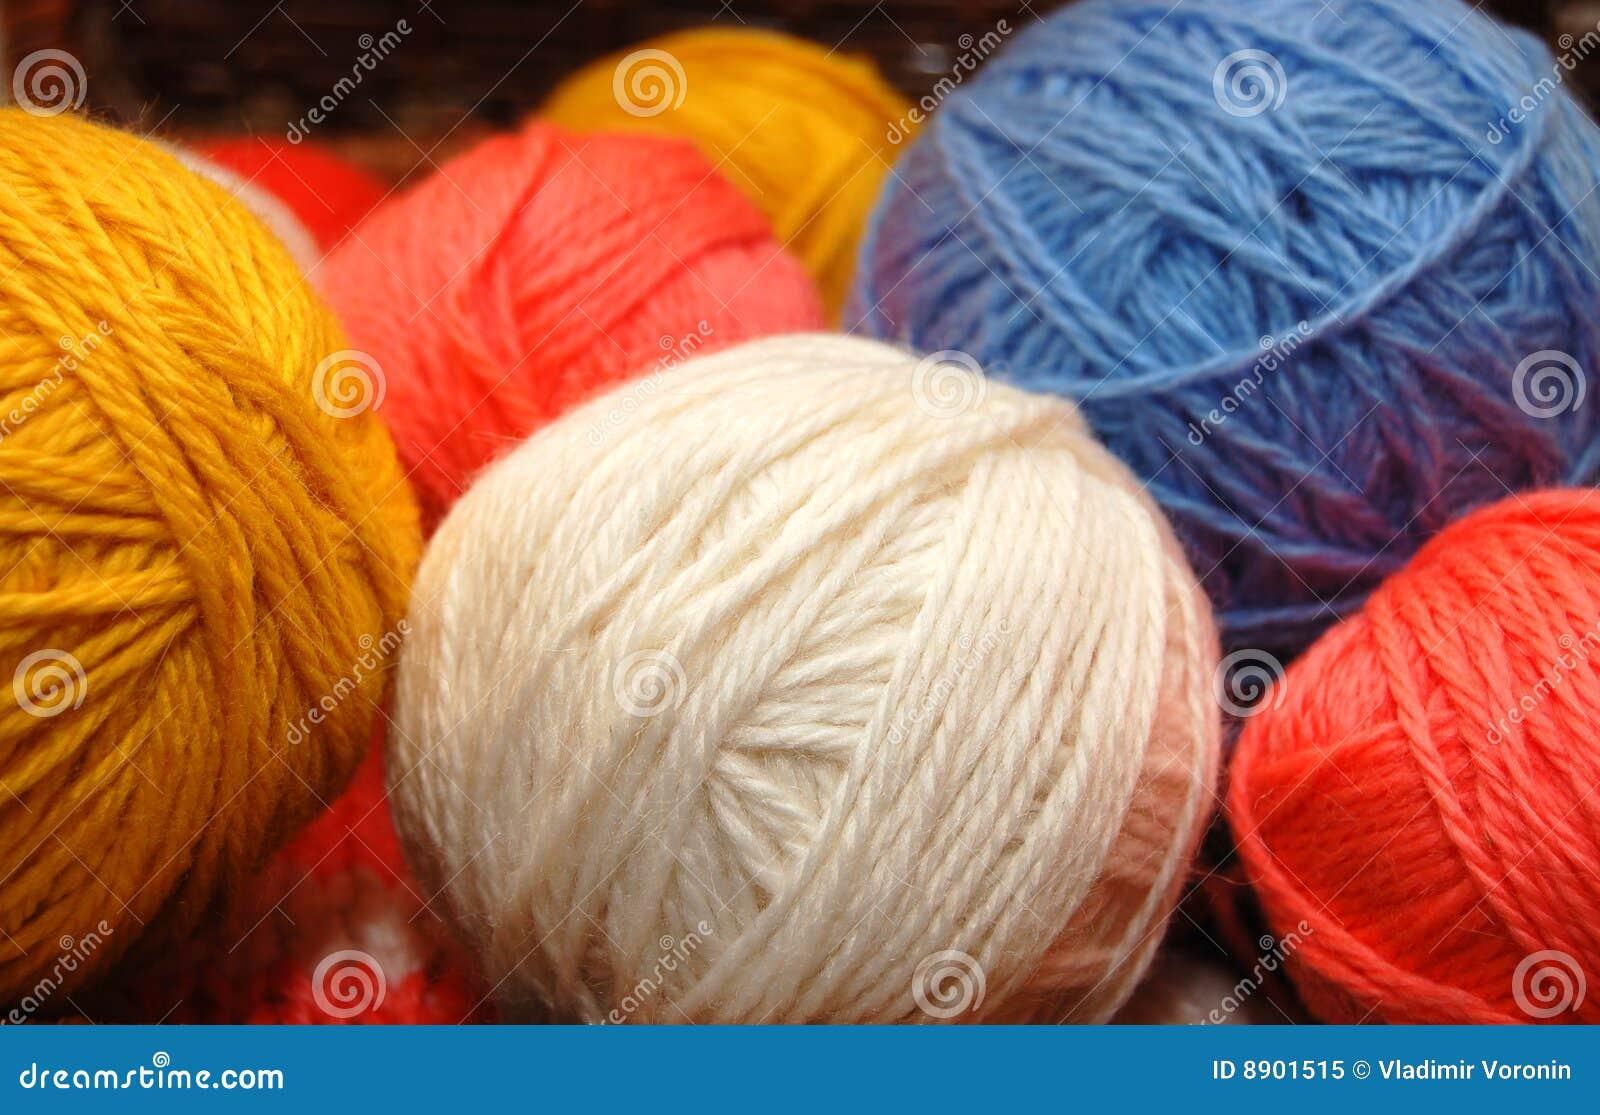 Импортная пряжа для вязания